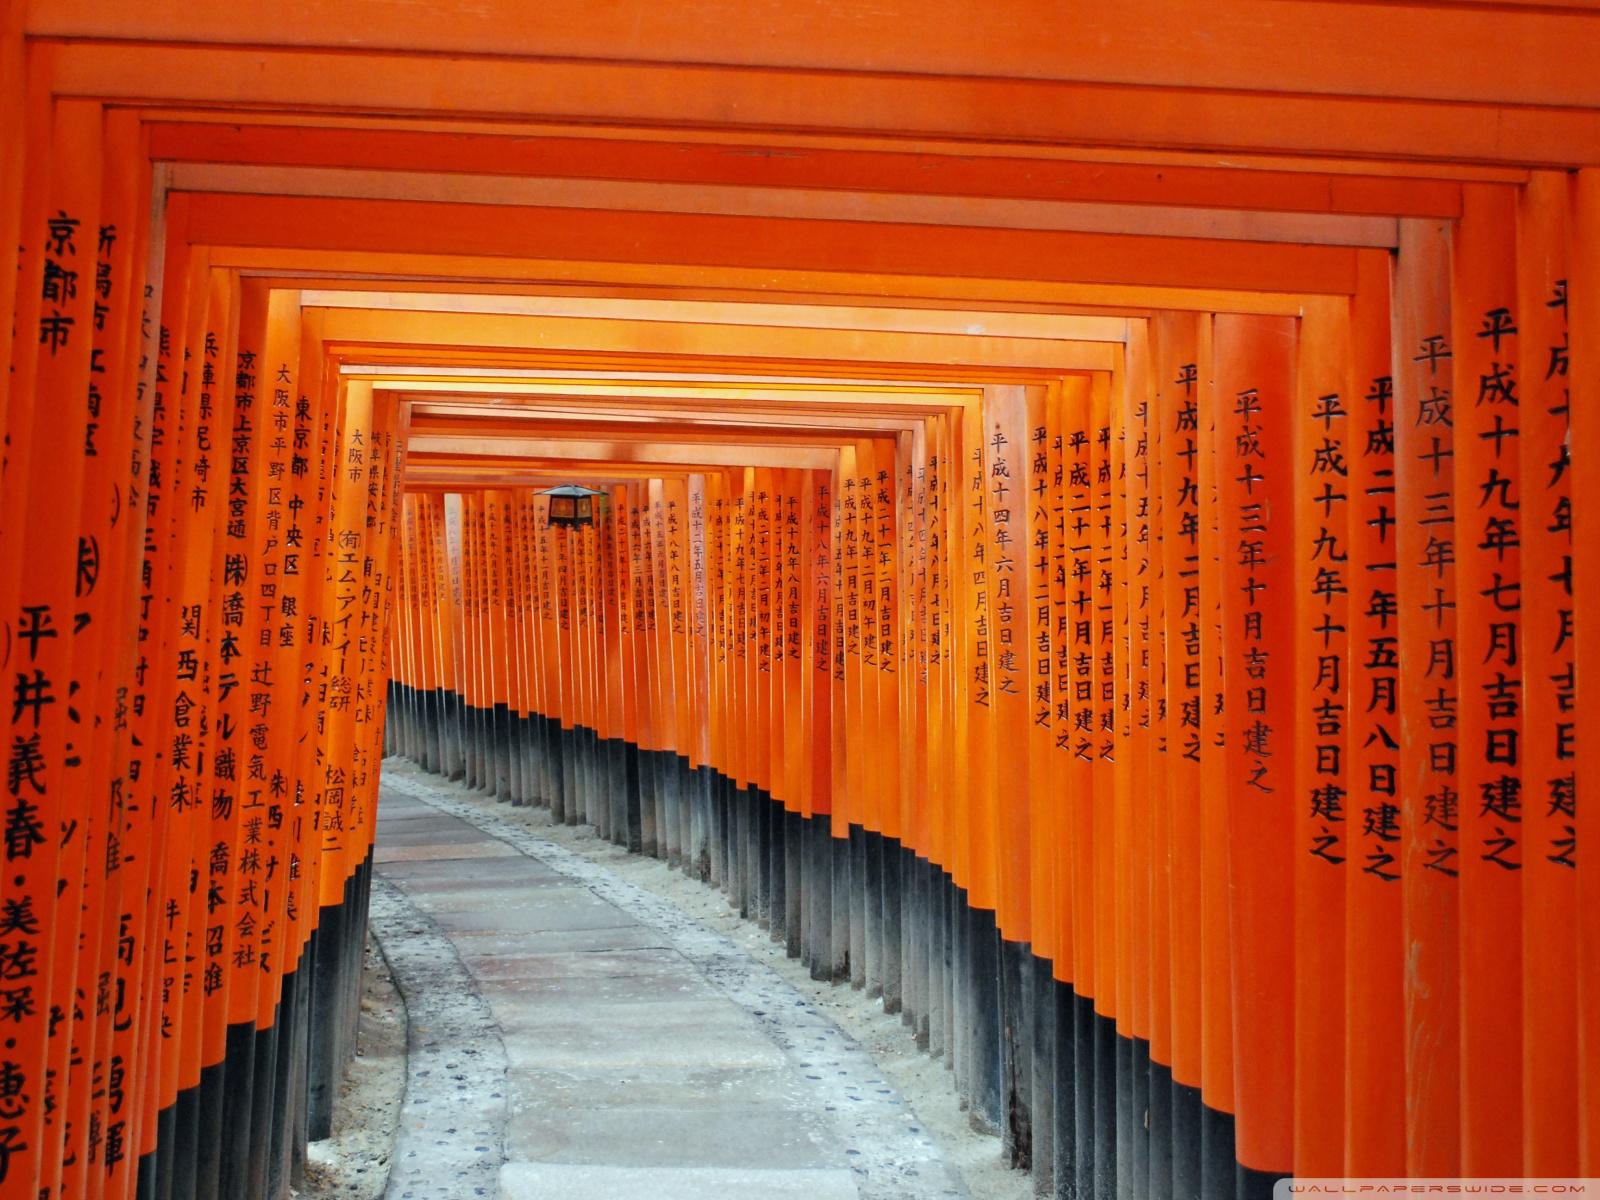 Fushimi Inari Taisha Kyoto Japan 4K HD Desktop Wallpaper for 1600x1200